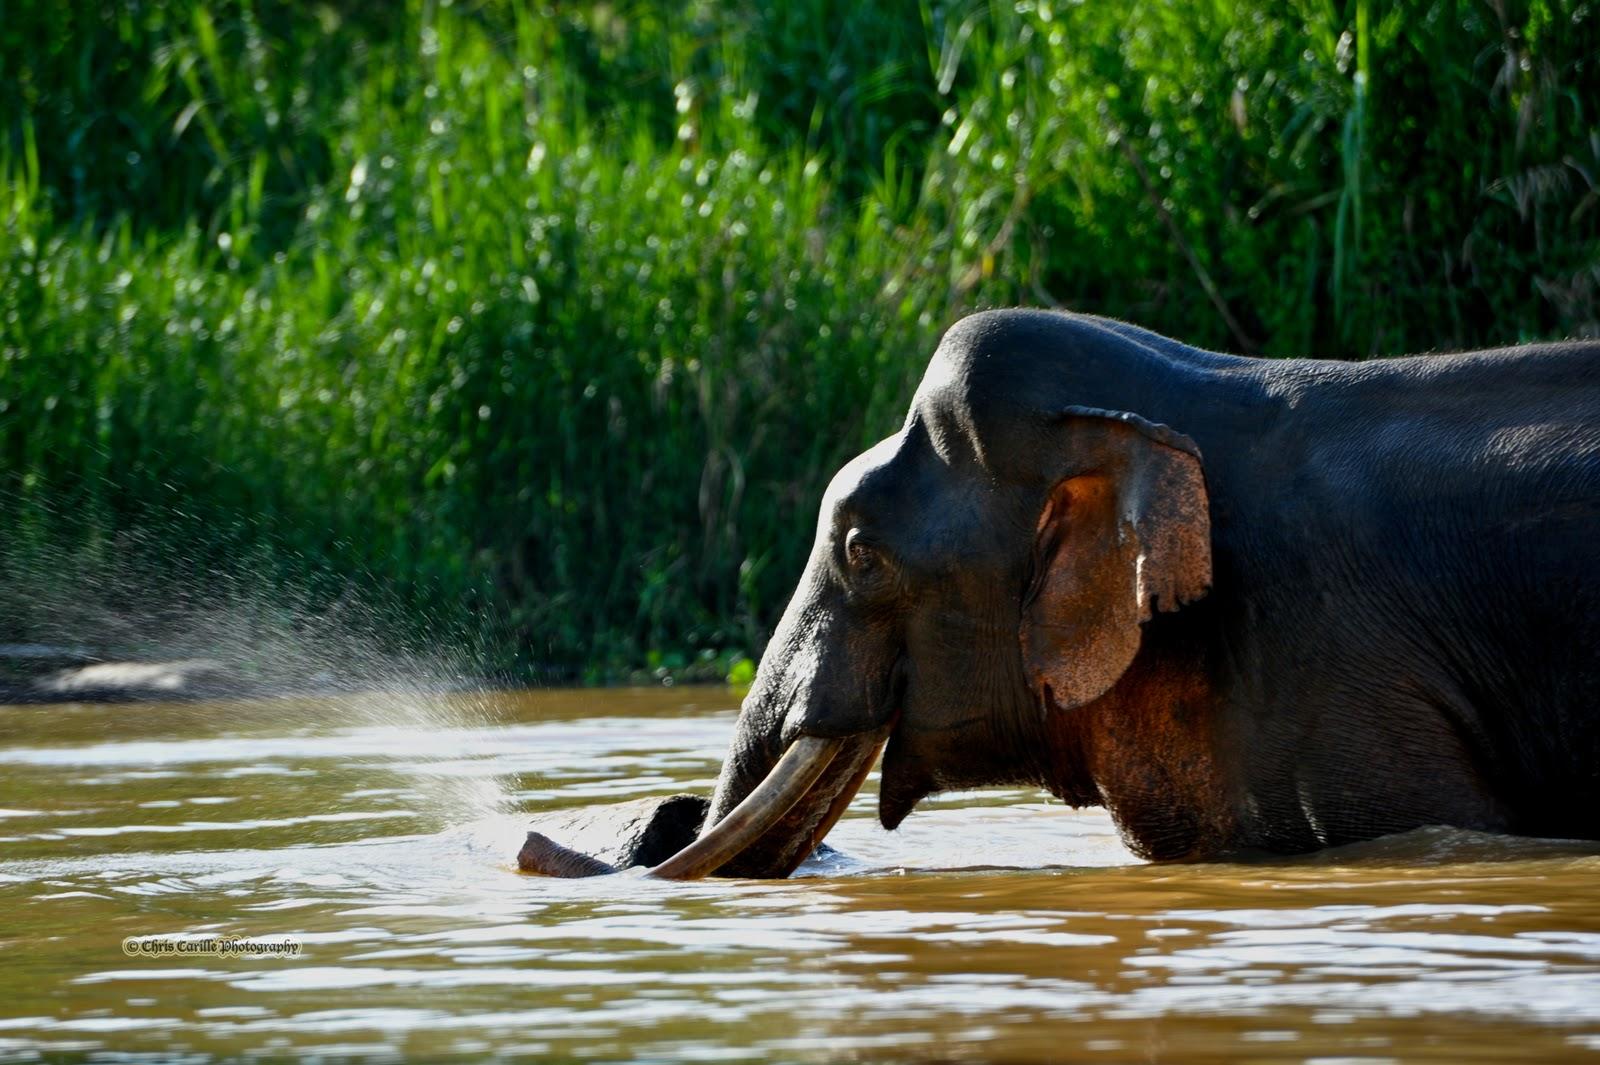 Elefante de Bornéu VS Potol Borneo+Pygmy+Elephant+%2528Elephas+maximus+borneensis%2529+20